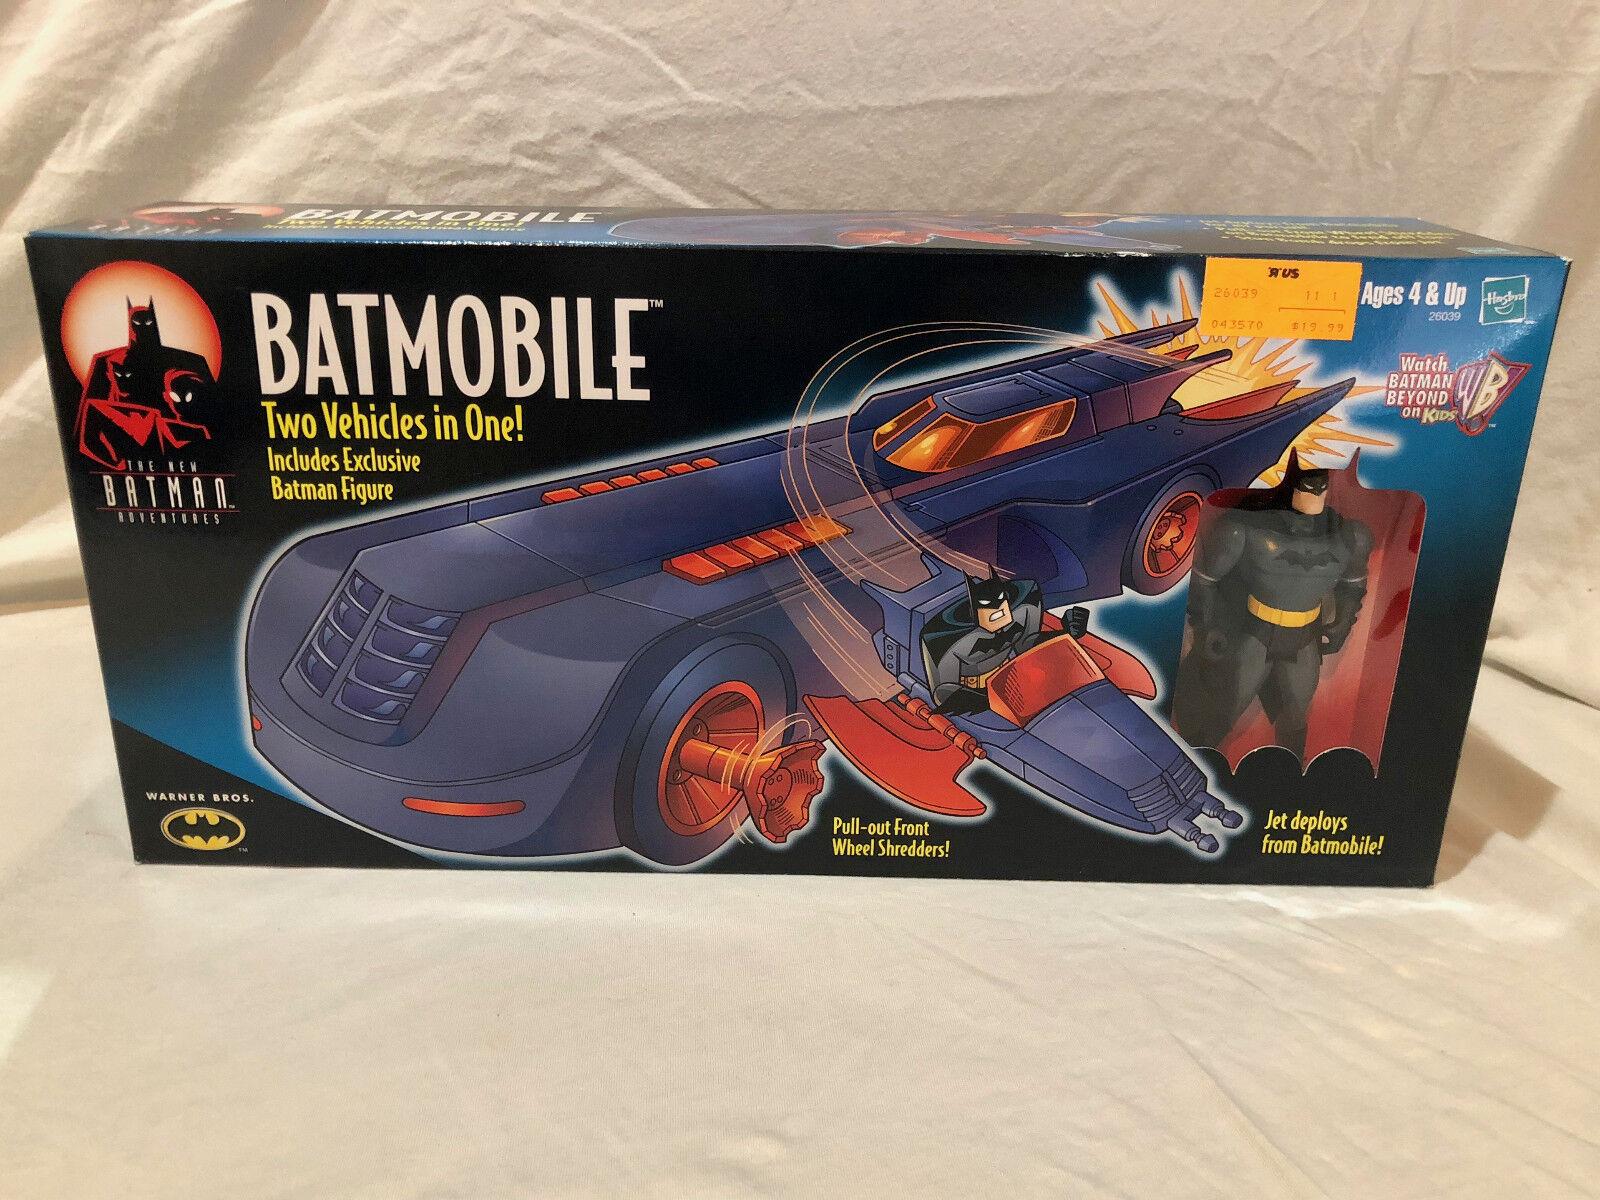 BATMAN ANIMATED SERIES - BATMOBILE VEHICLE & FIGURE - NEW IN BOX - RARE - 2000